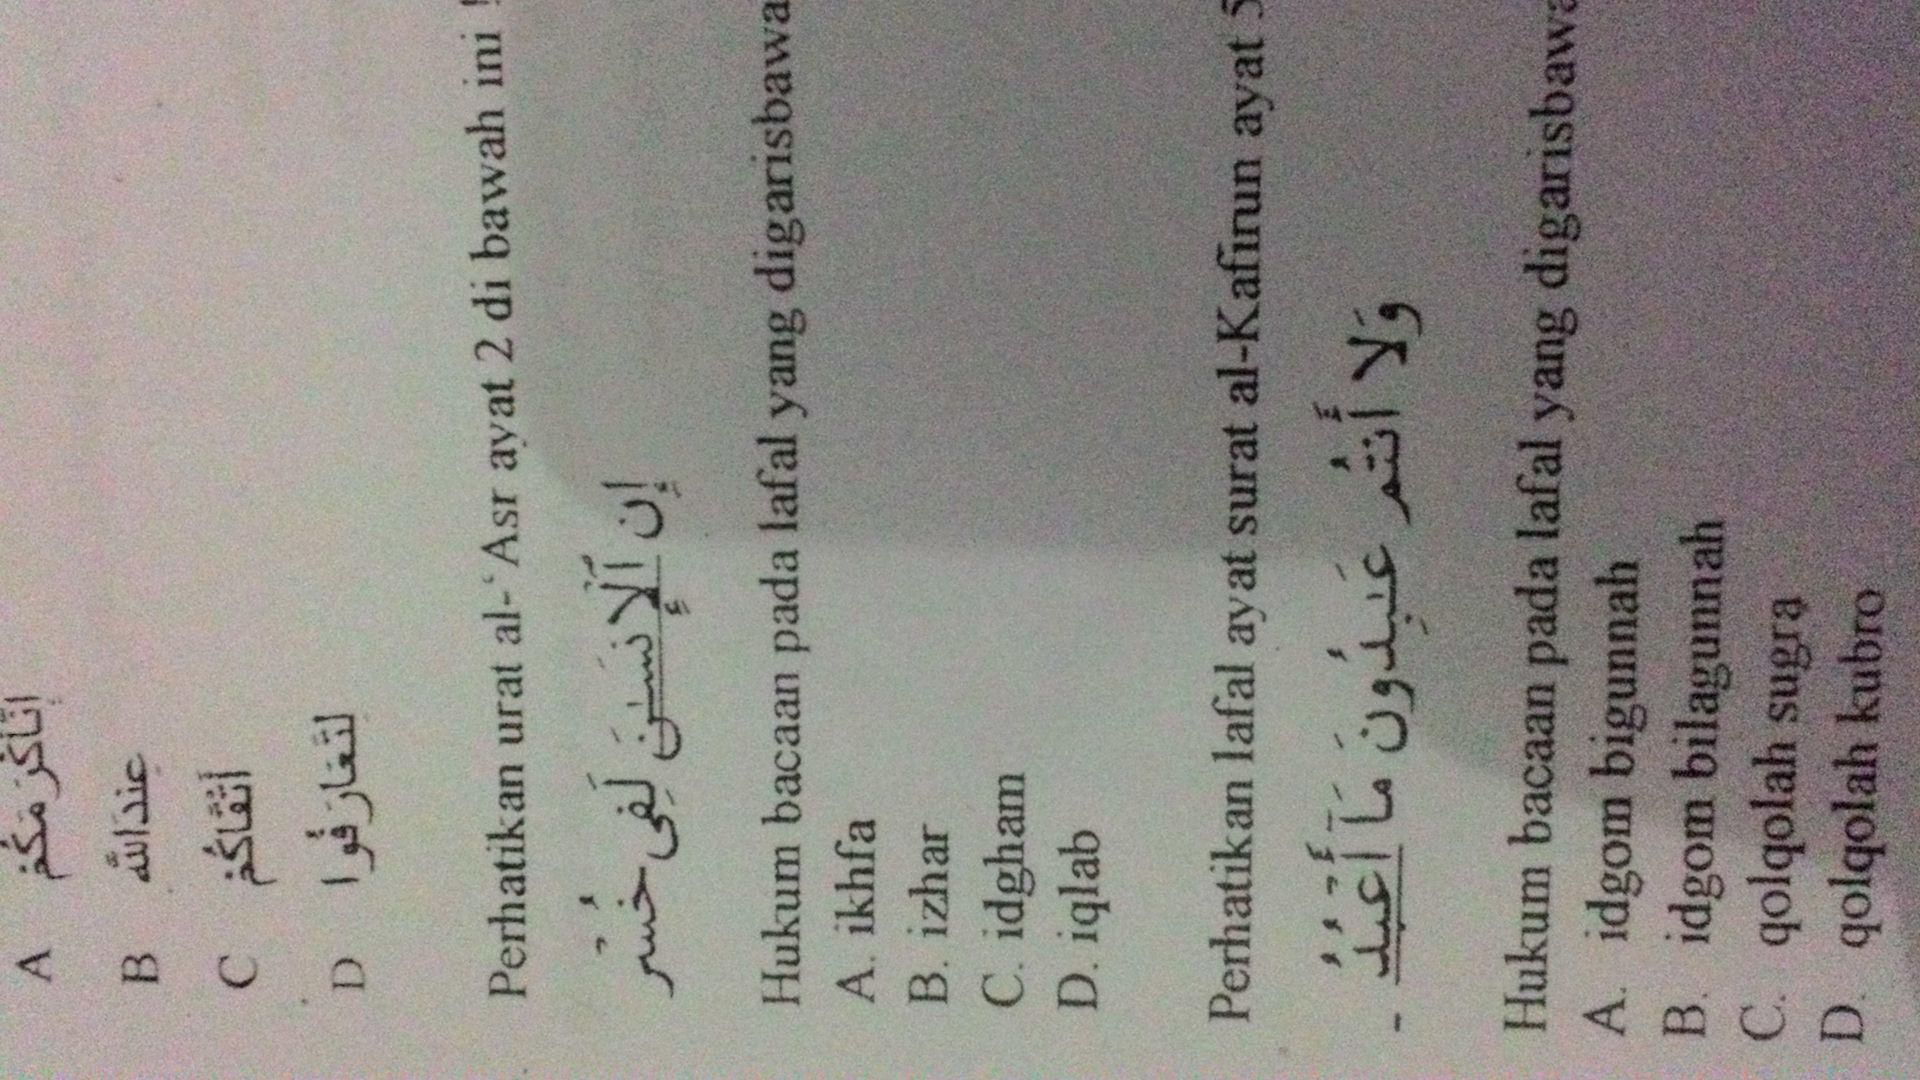 Tulisan Arab Asmaul Husna Dan Artinya Beserta Harakat : tulisan, asmaul, husna, artinya, beserta, harakat, Hukum, Bacaan, Lafal, Digaris, Bawahi, Adalah, Brainly.co.id